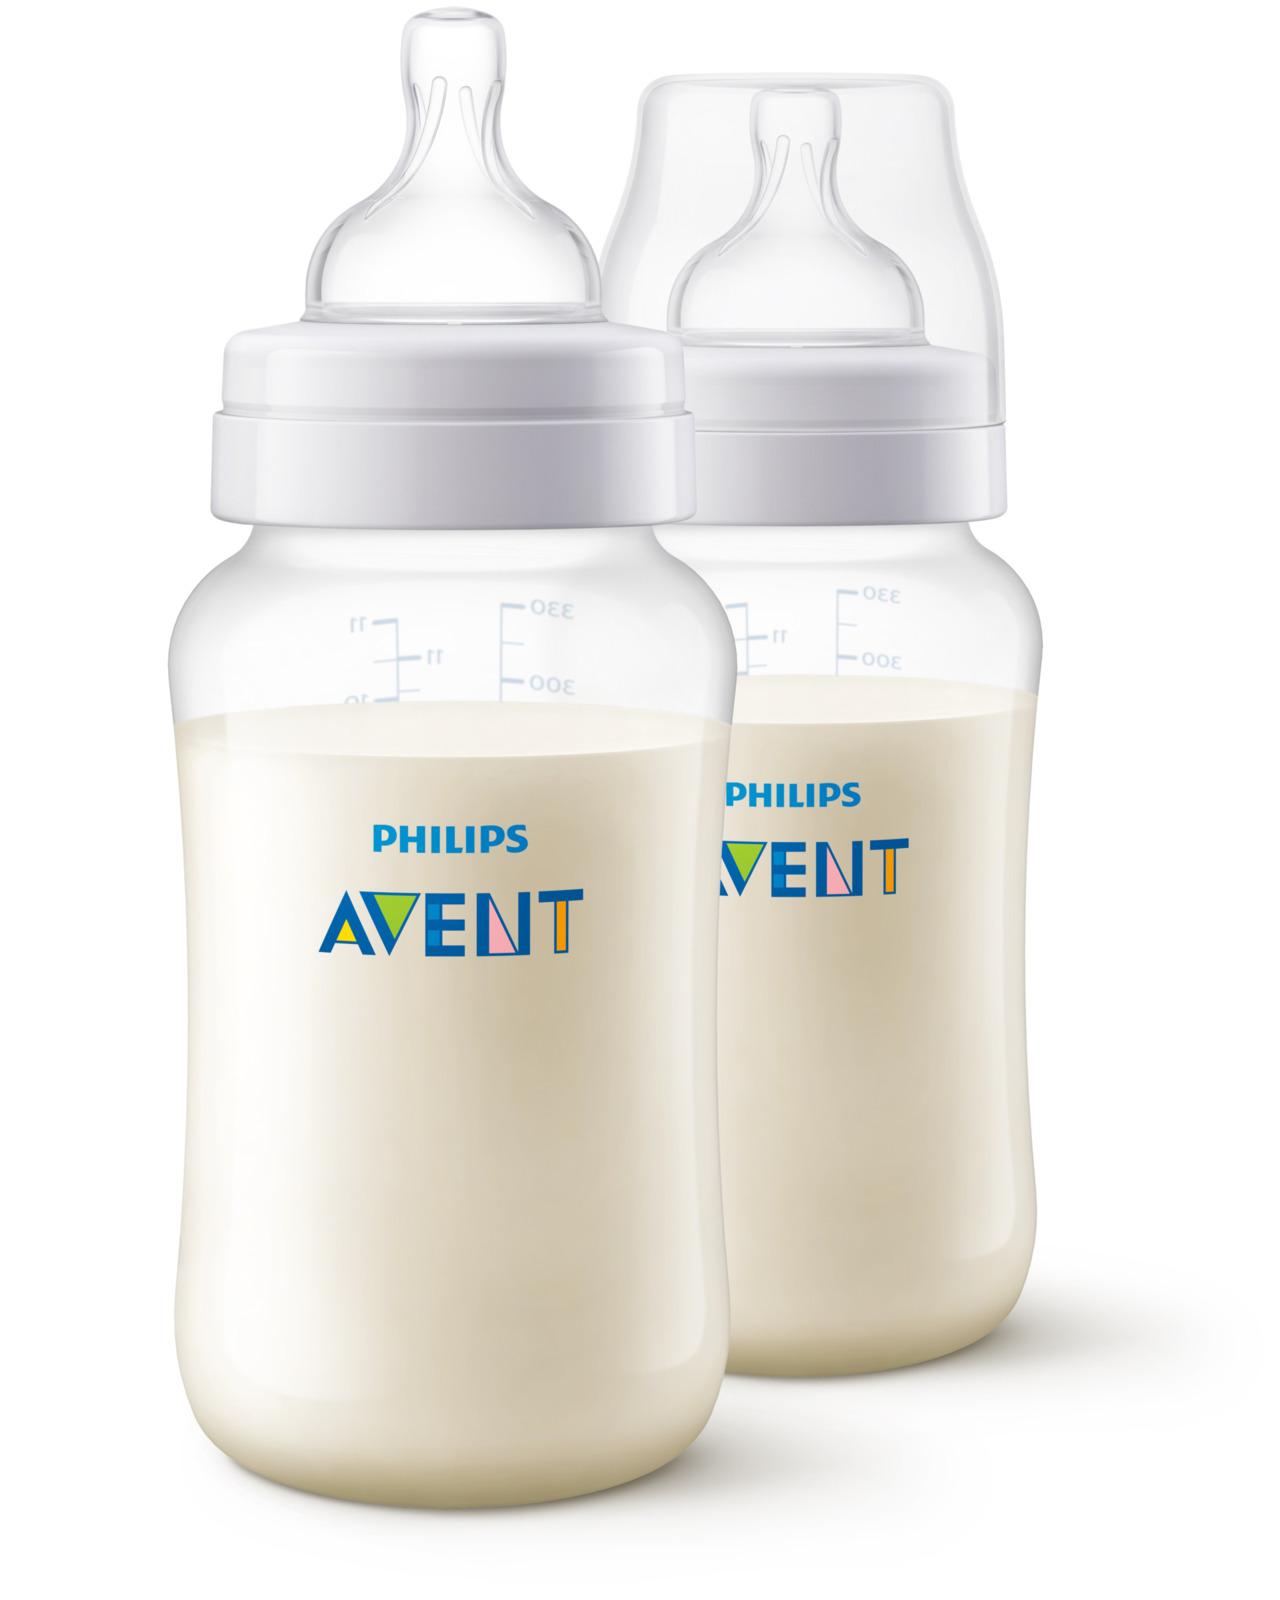 Бутылочка для кормления Philips Avent Anti-colic, от 3 месяцев, SCF816/27, 330 мл, 2 шт телевизор philips 32pht4132 60